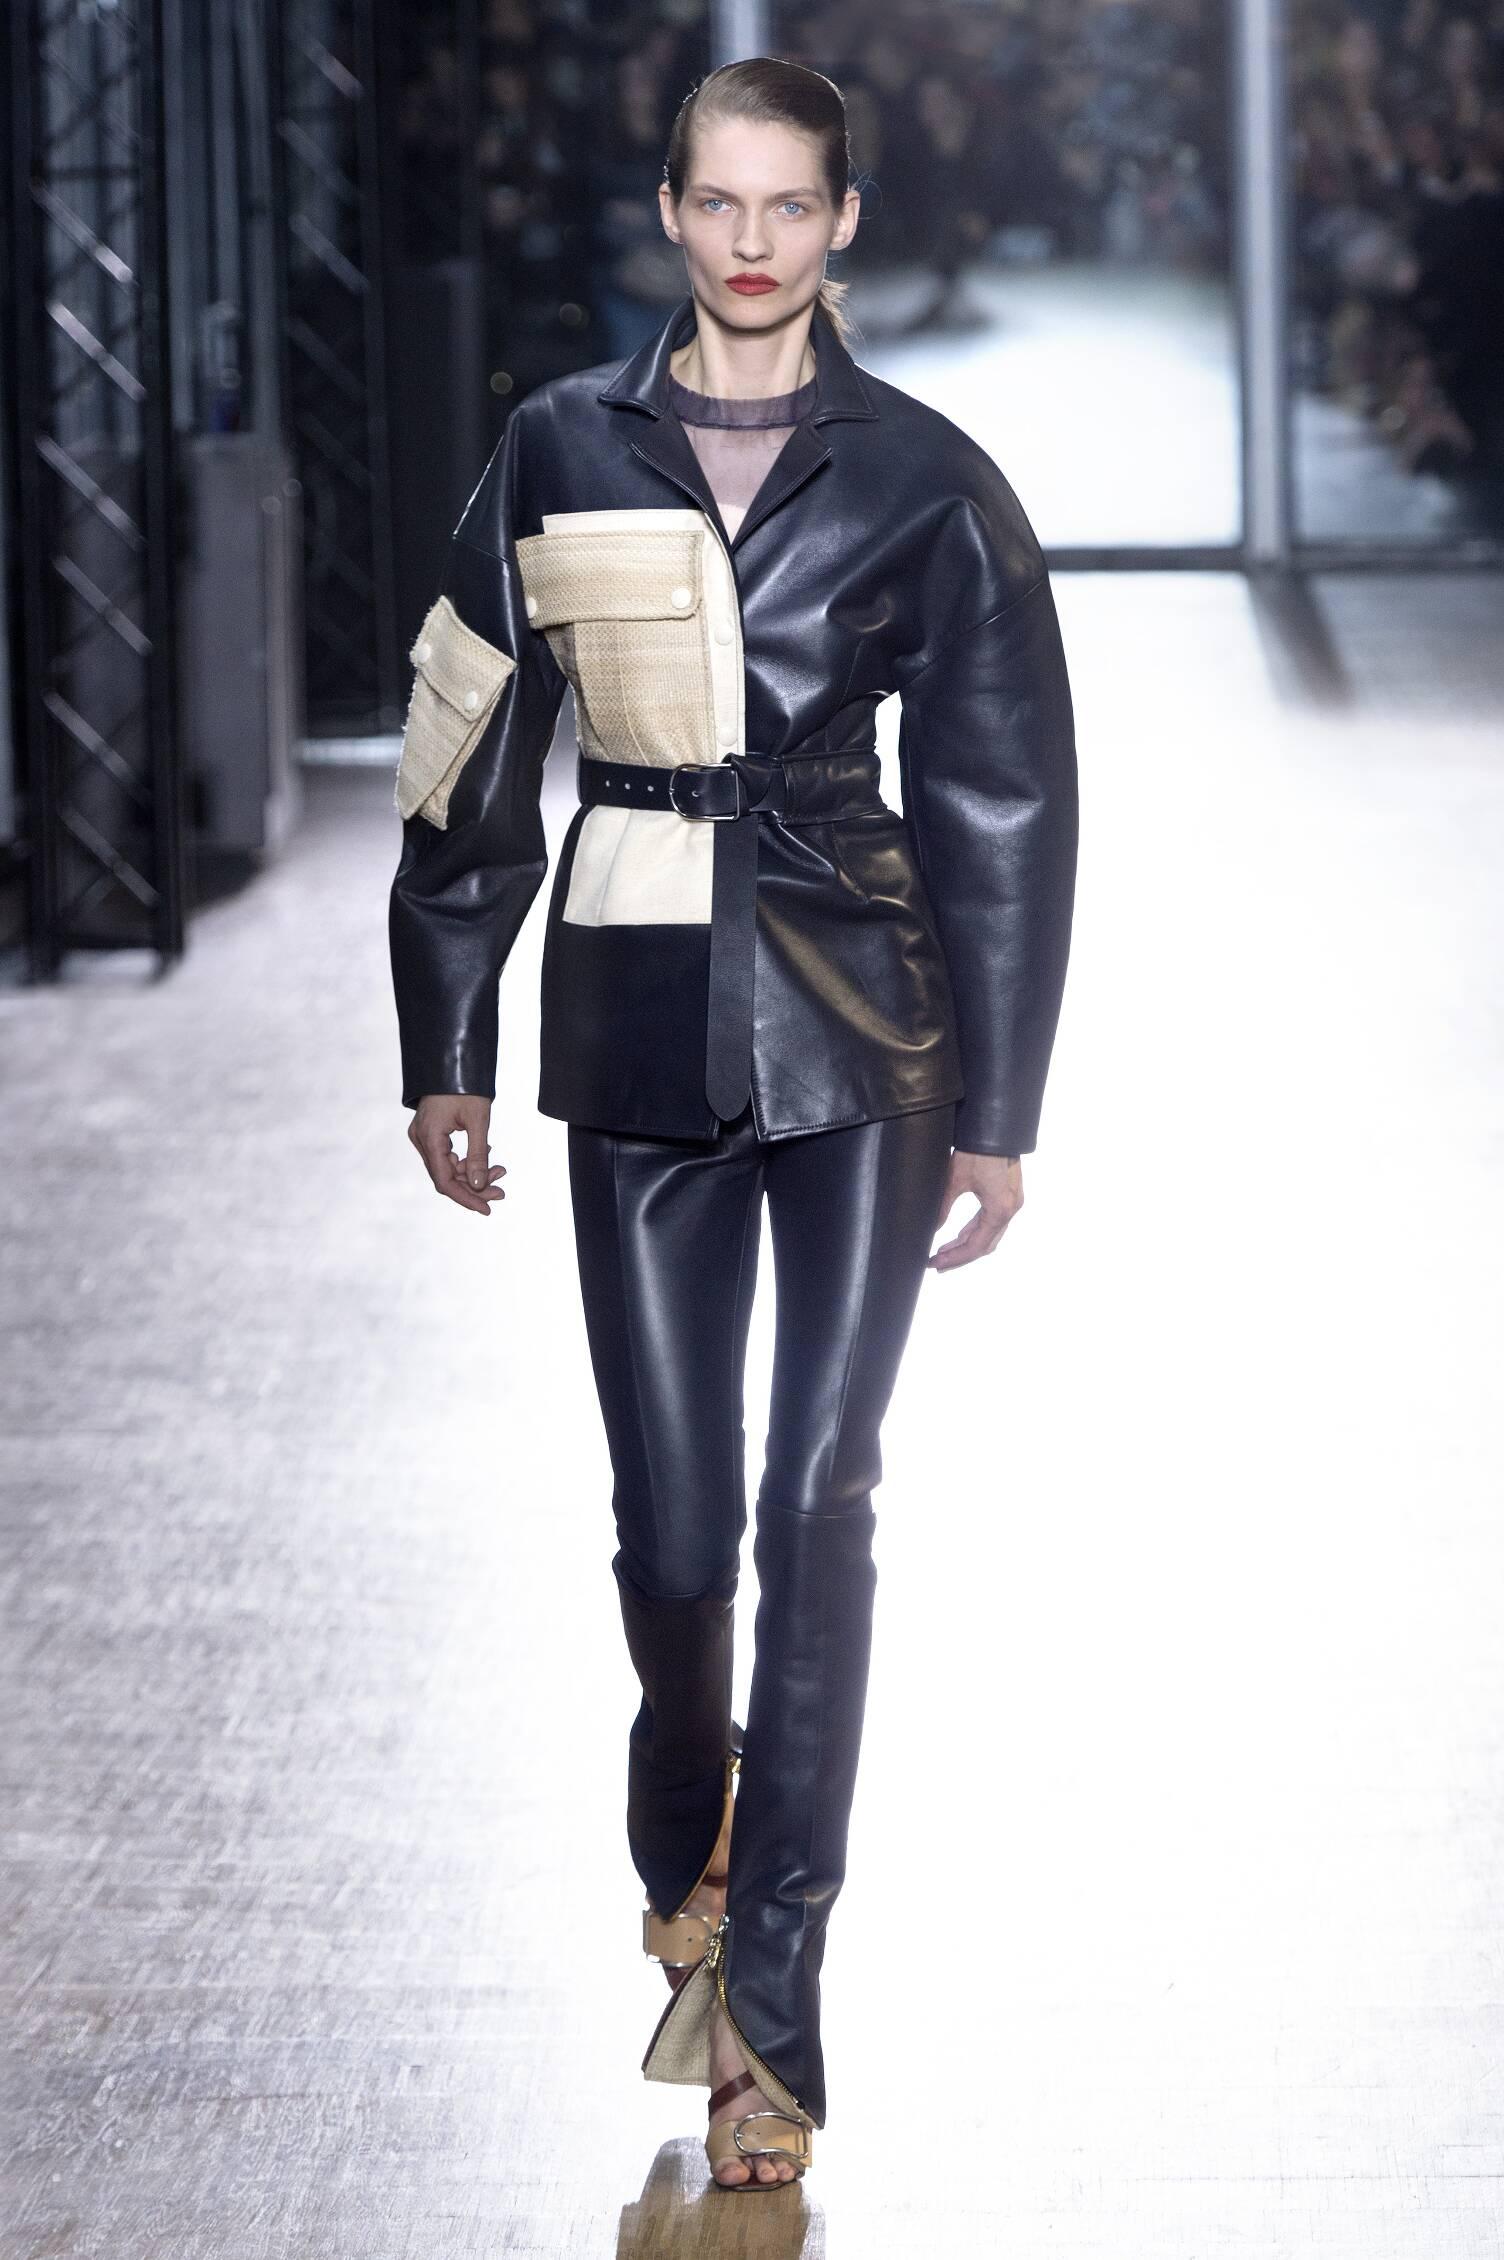 Runway Acne Studios Fall Winter 2015 16 Women's Collection Paris Fashion Week